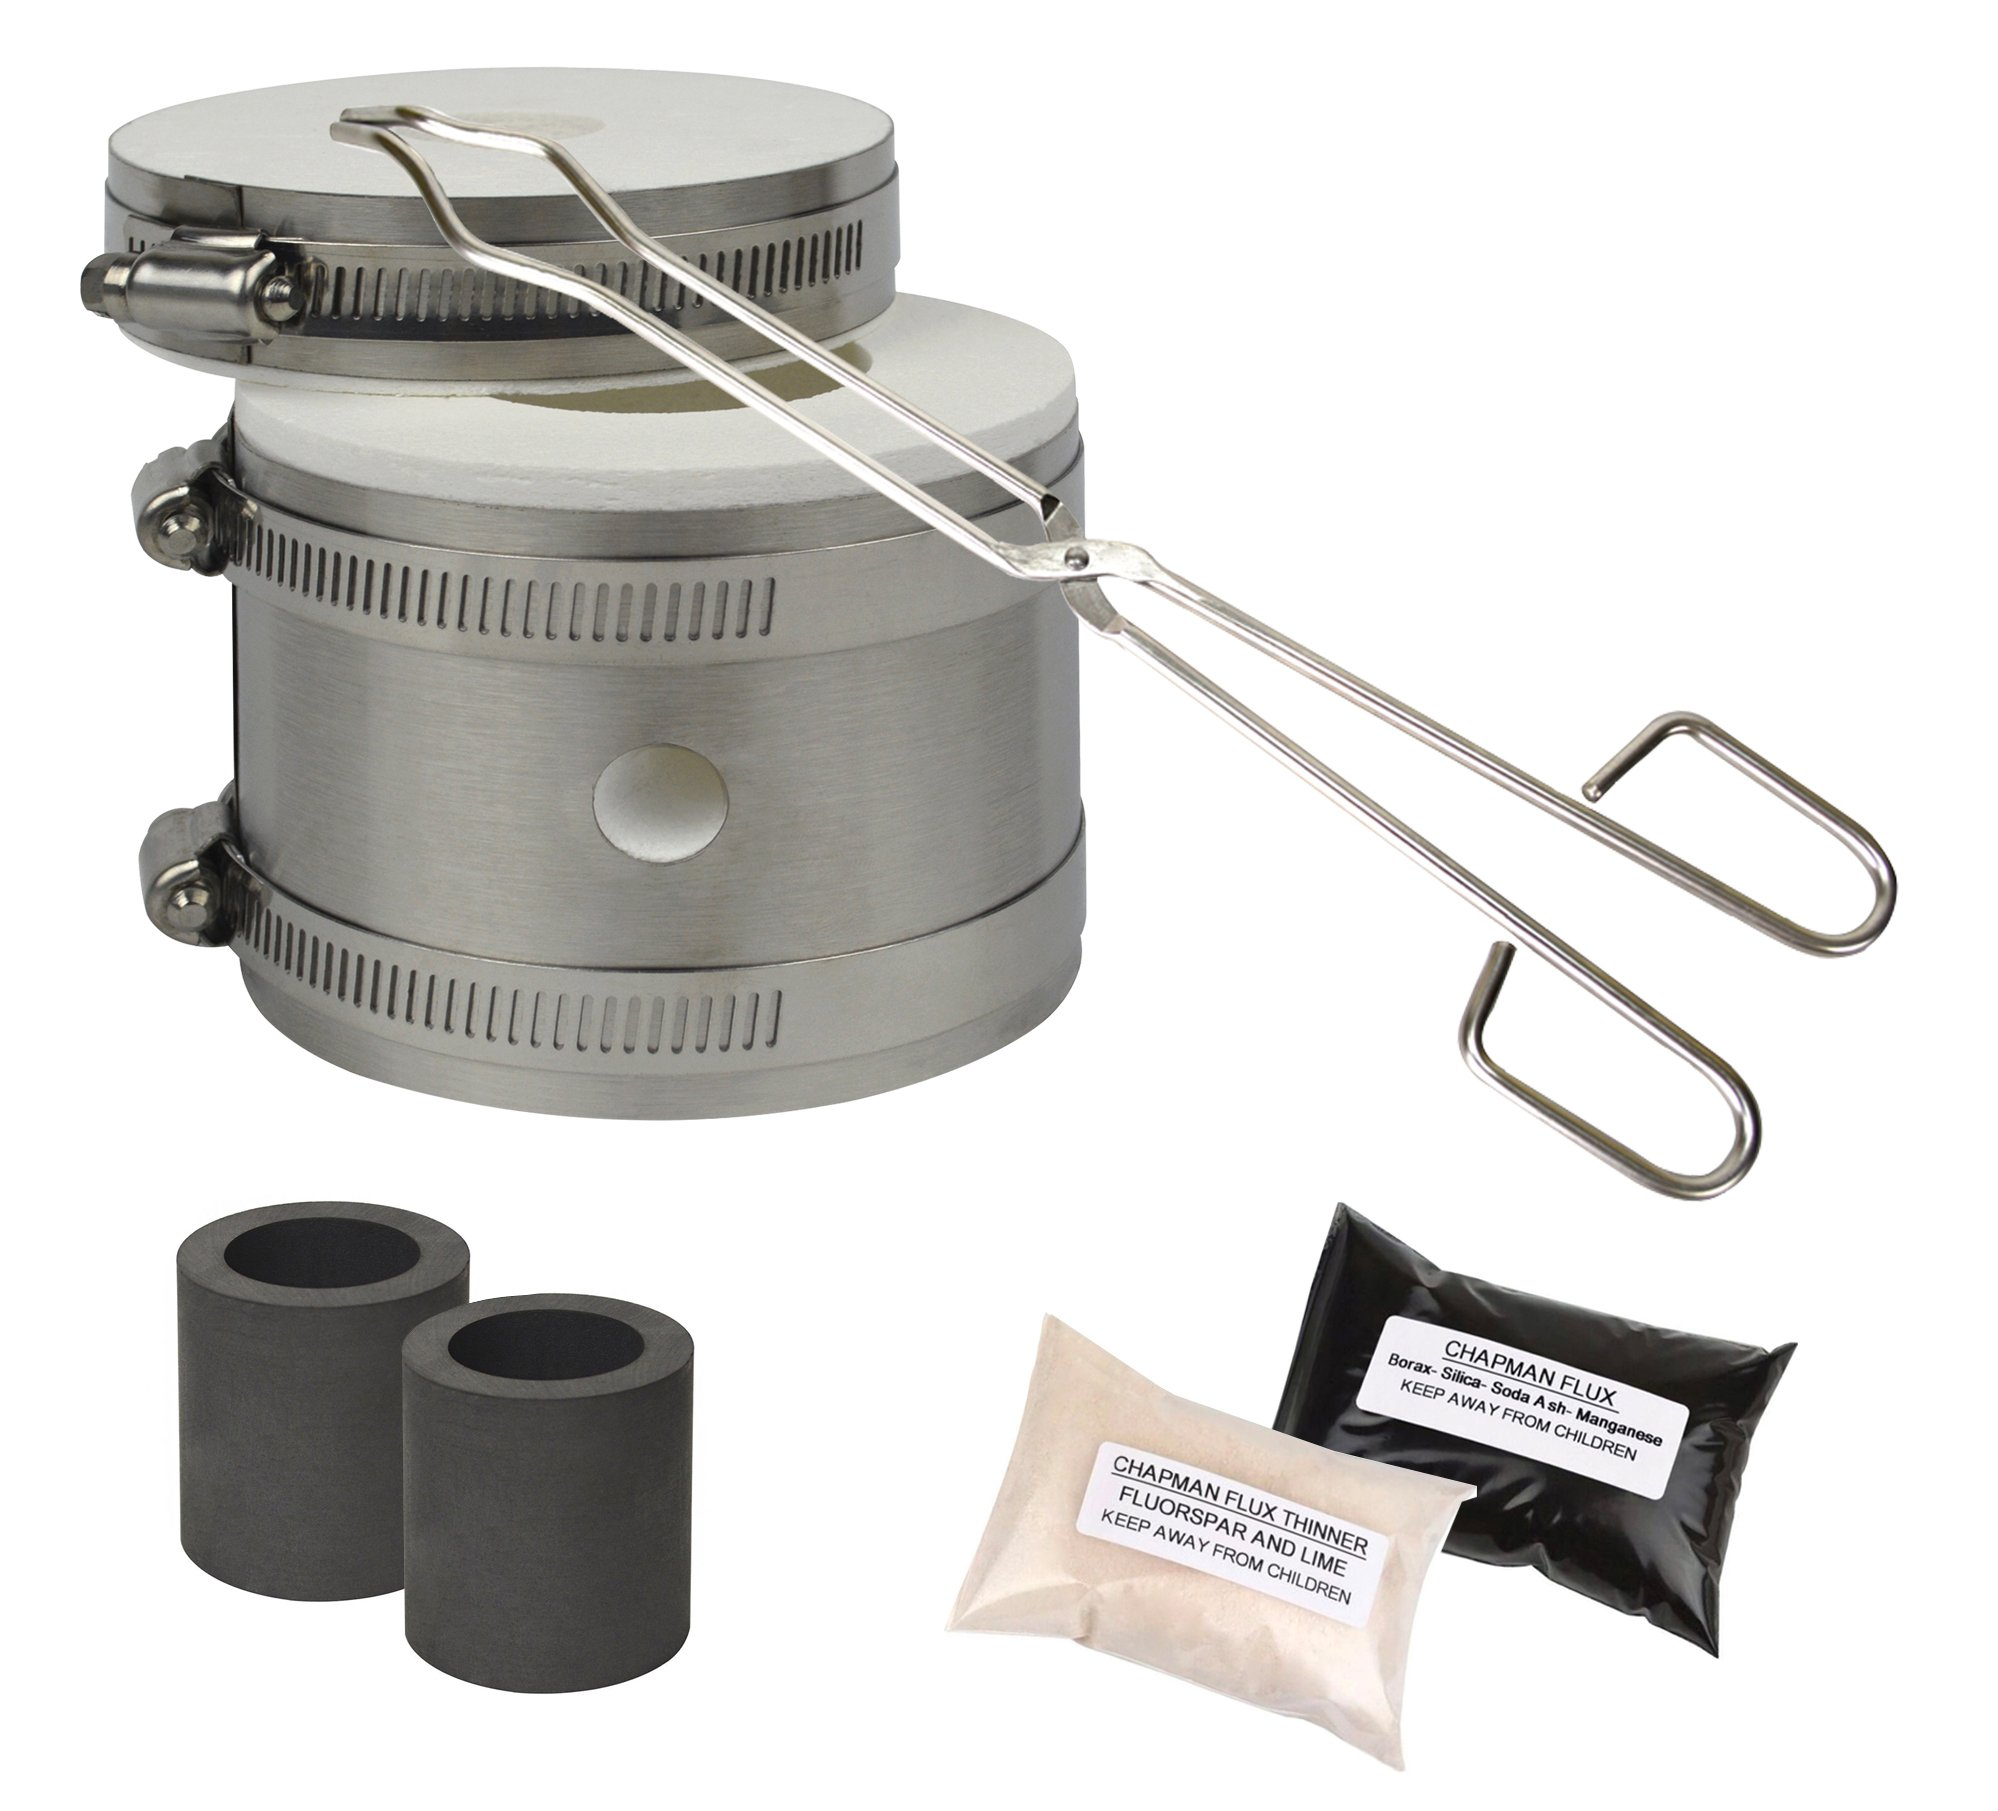 Mini Kwik Kiln Kit w/Tongs Chapman Flux Flux Thinner & 2 Graphite Crucibles Jewelry Making Gold Silver Melting Casting Gas Furnace Kit